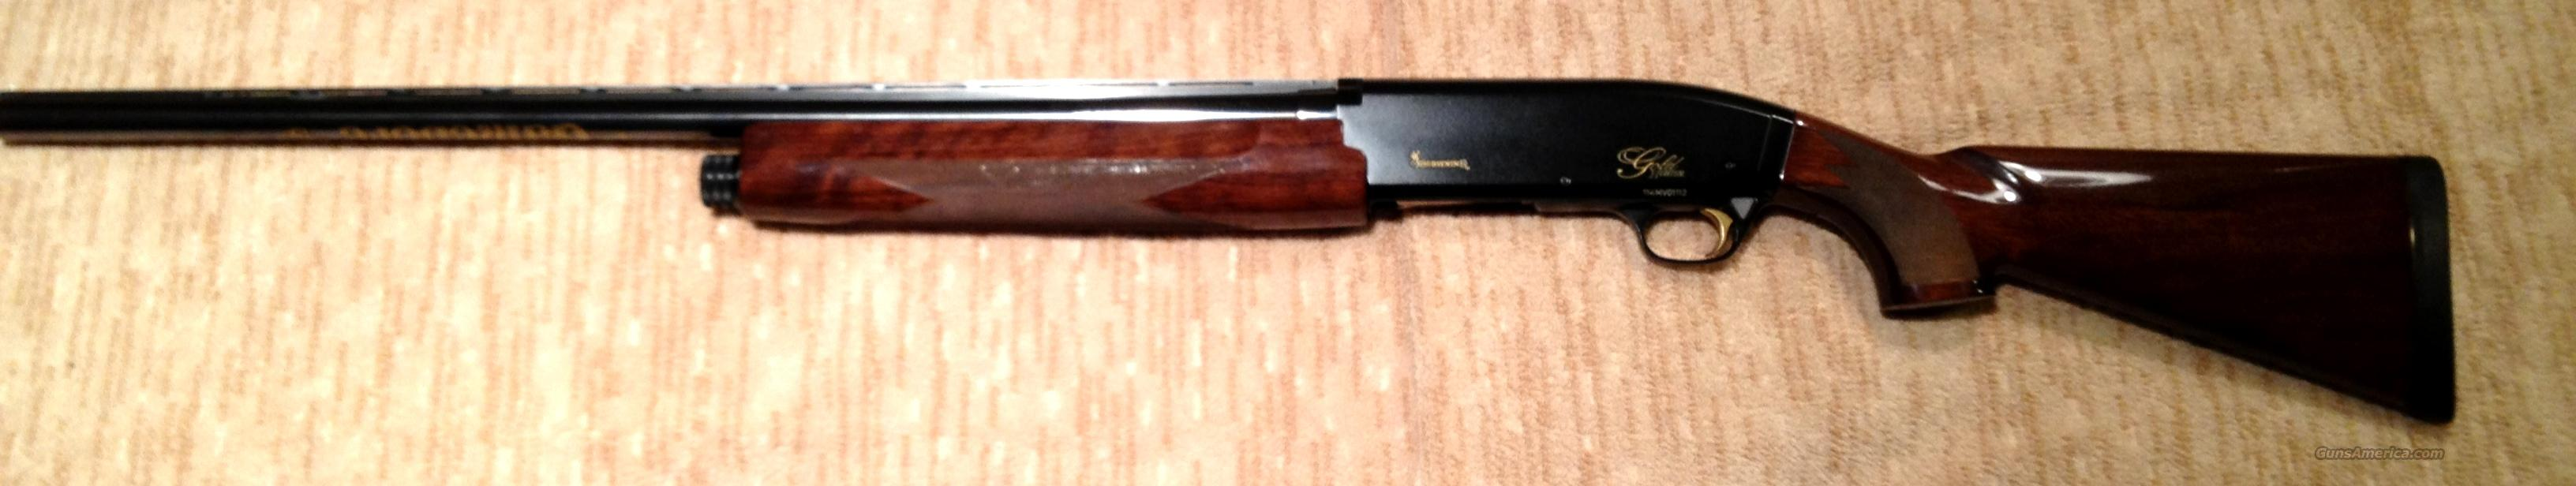 Browning Gold Hunter 20 Gauge Shotgun (Youth Model - 13 inch stock)  Guns > Shotguns > Browning Shotguns > Autoloaders > Hunting